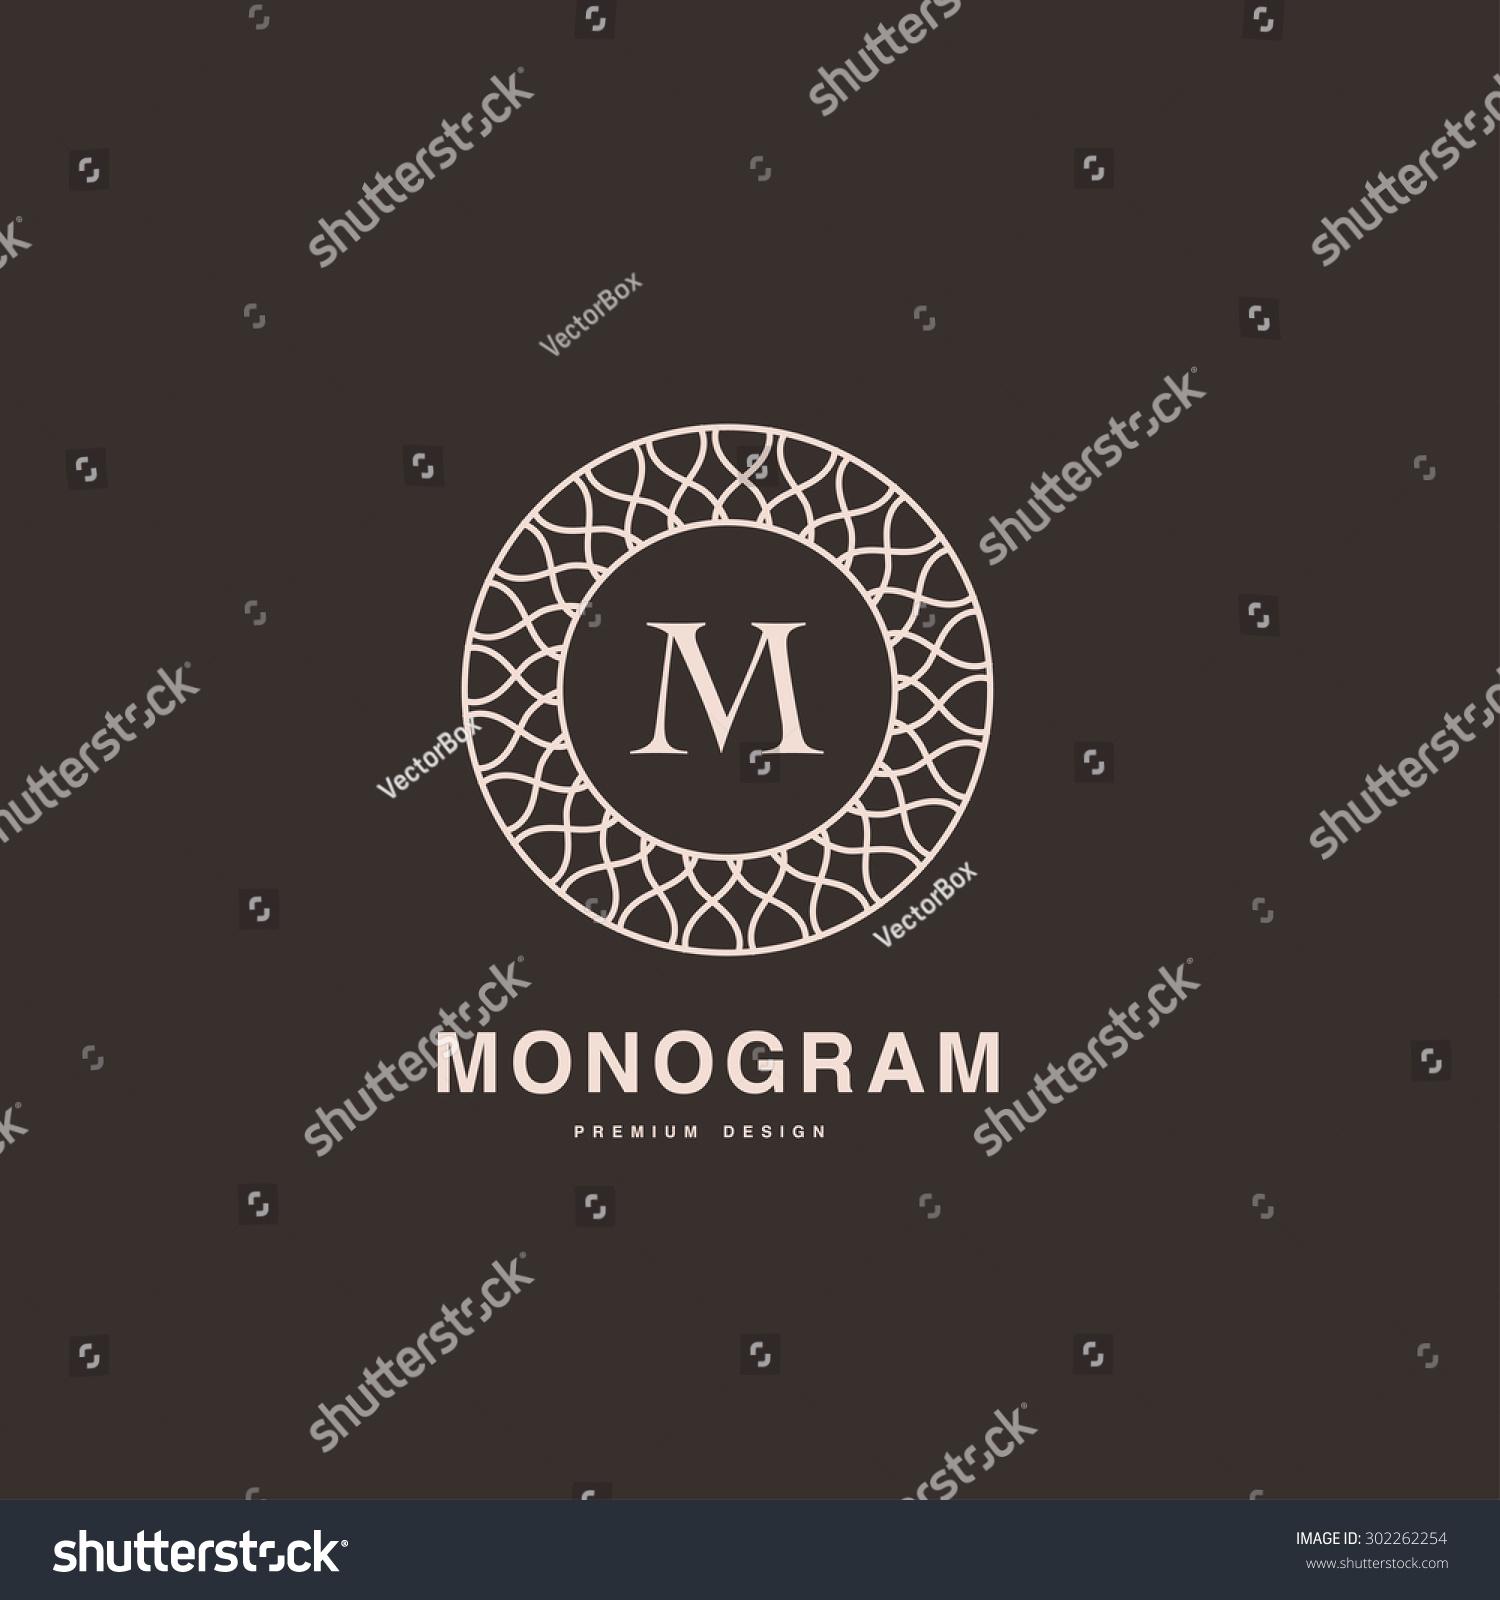 Abstract Monogram Elegant Logo Design Template Stock Vector (2018 ...